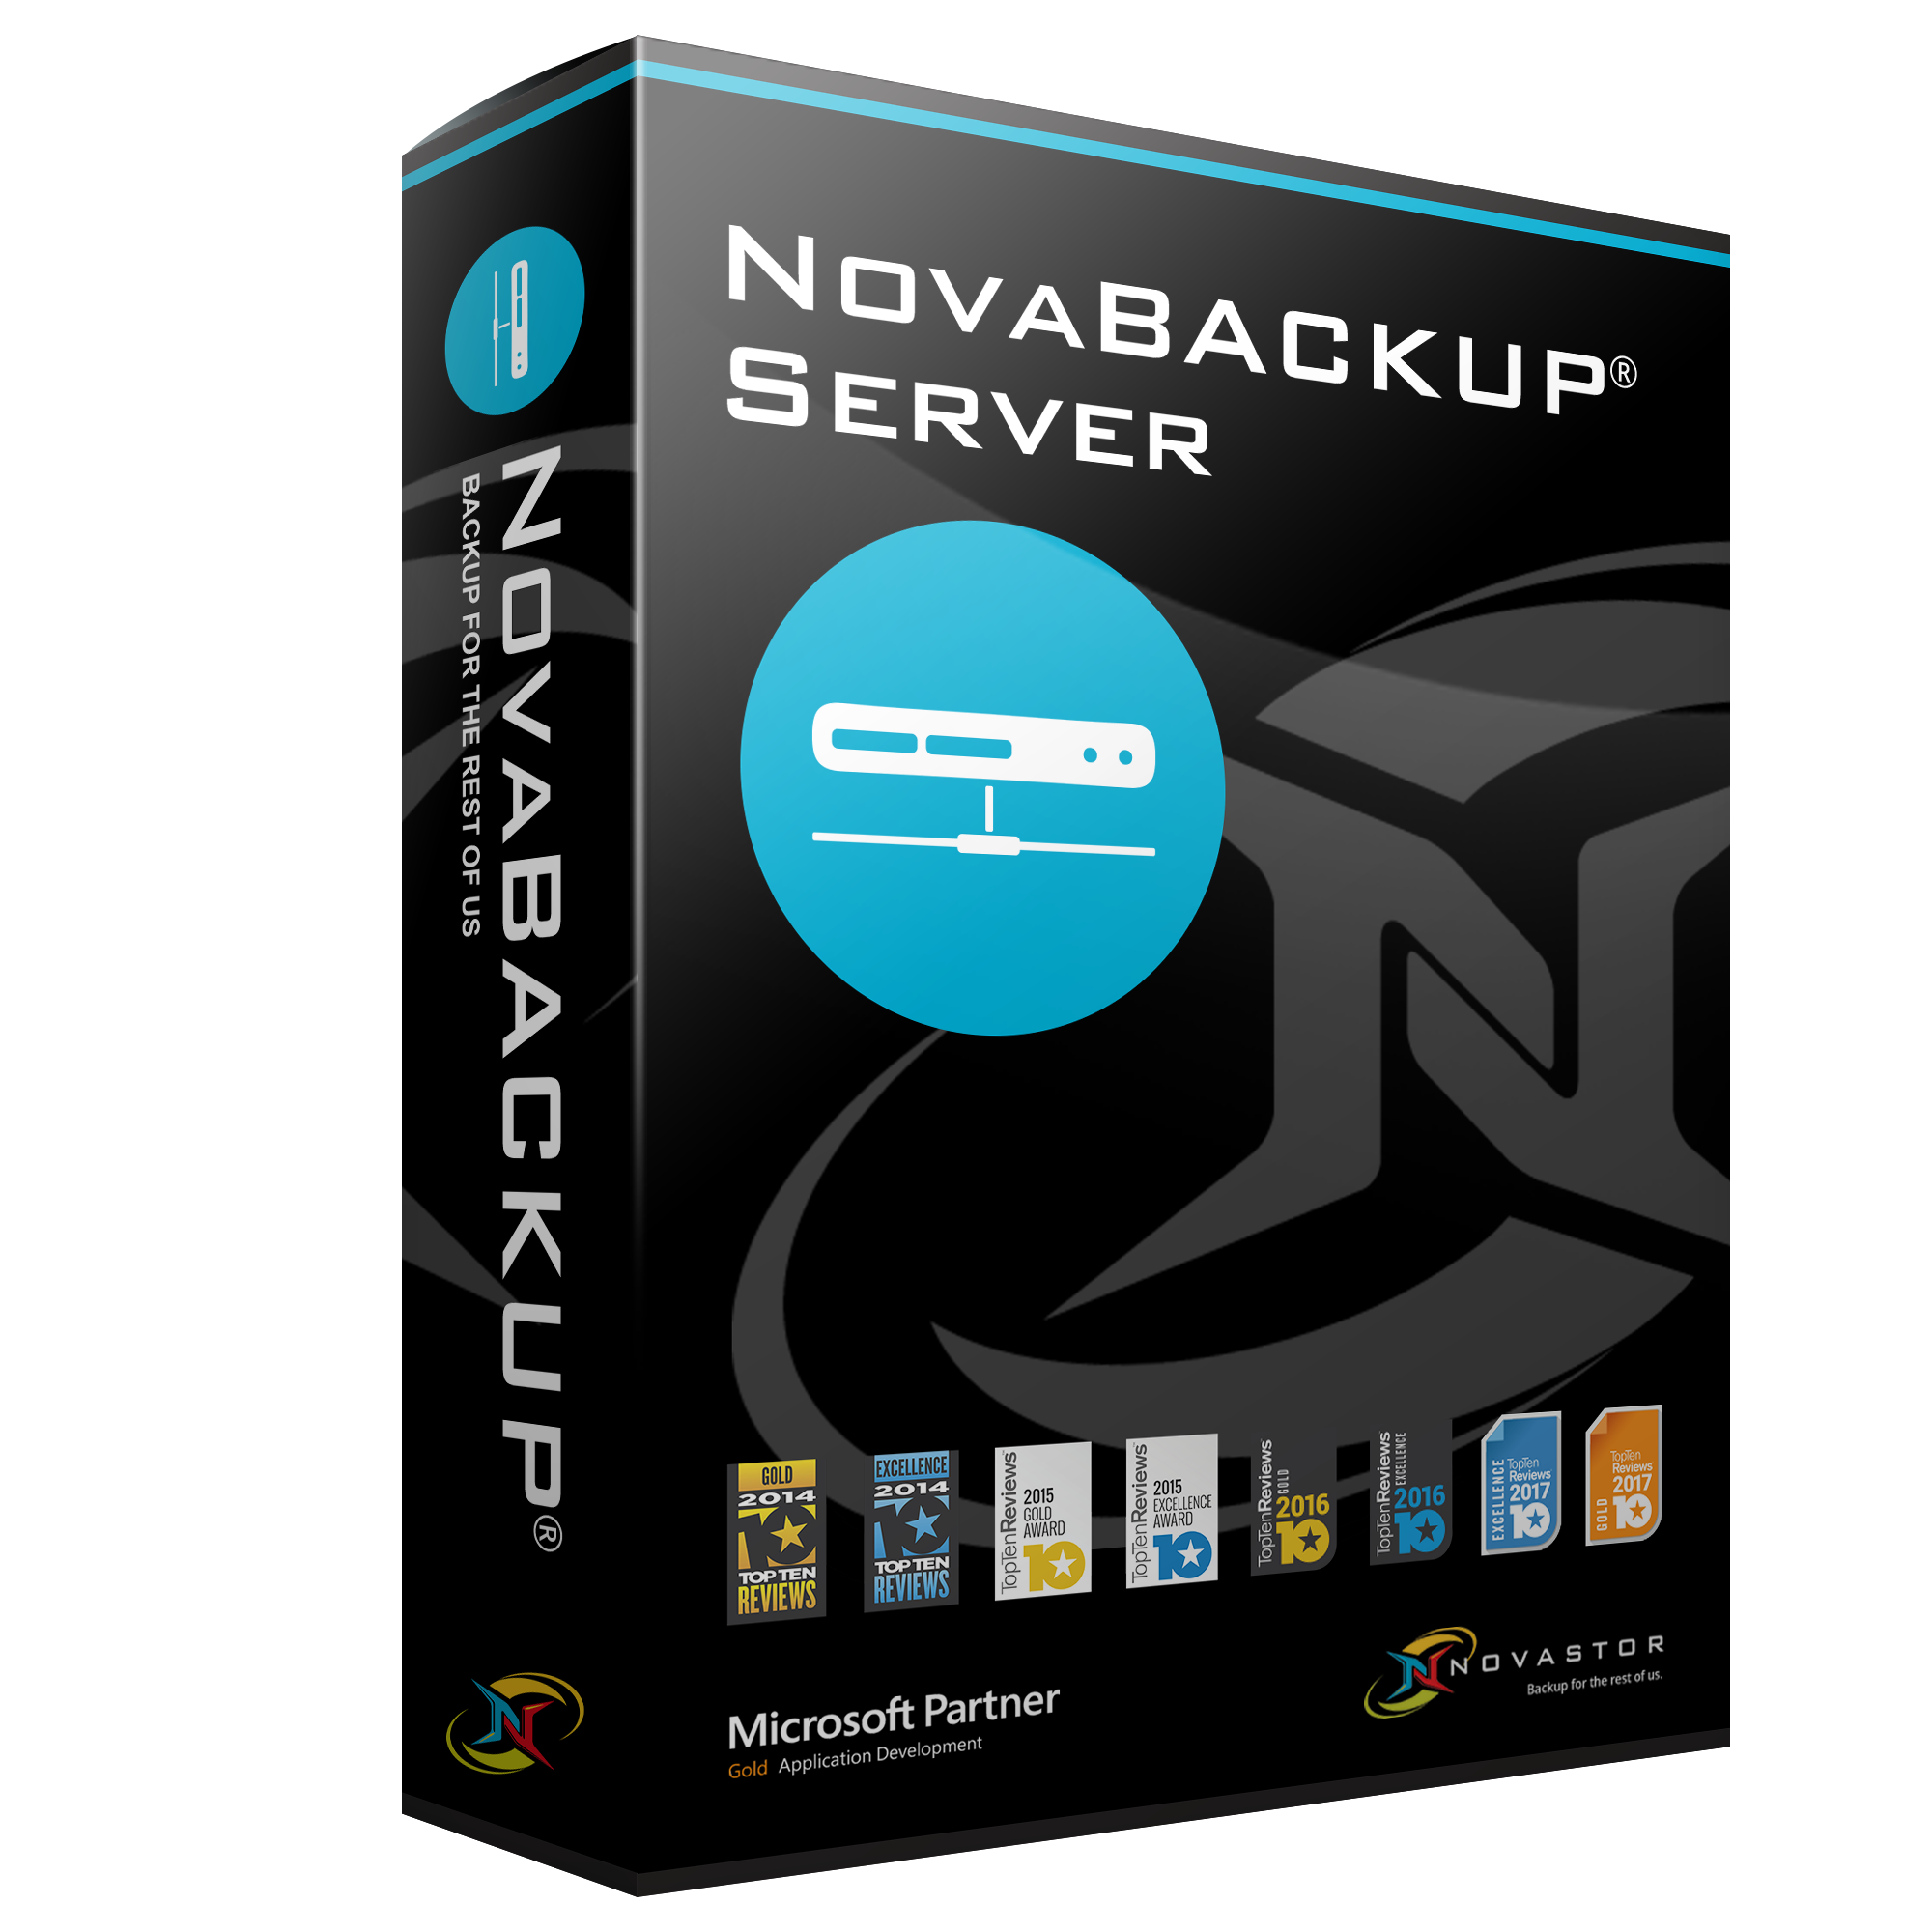 NovaBACKUP-box_Server_right